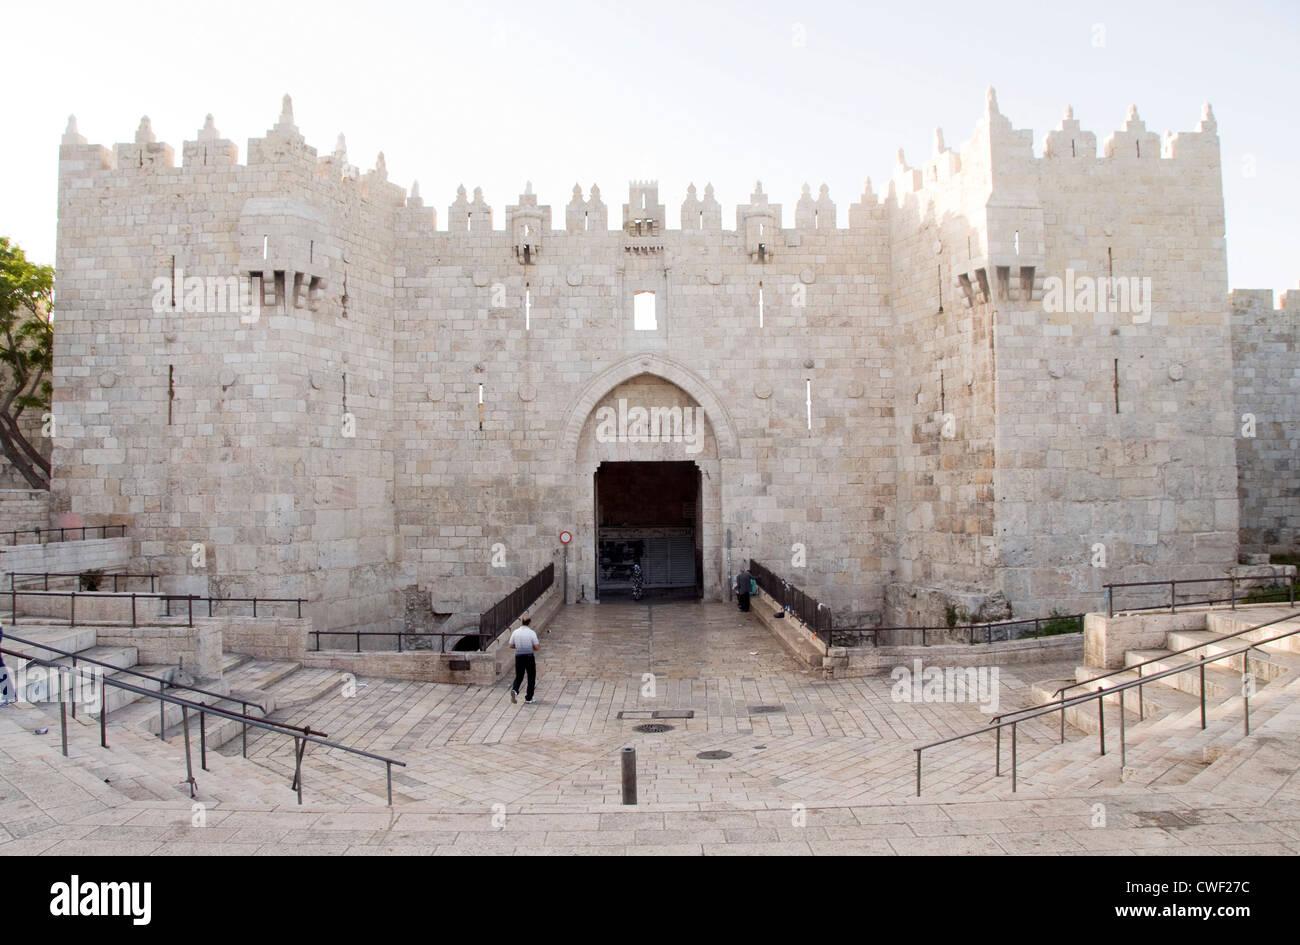 historic Damascus Gate entry to Old City Jerusalem Palestine Israel - Stock Image